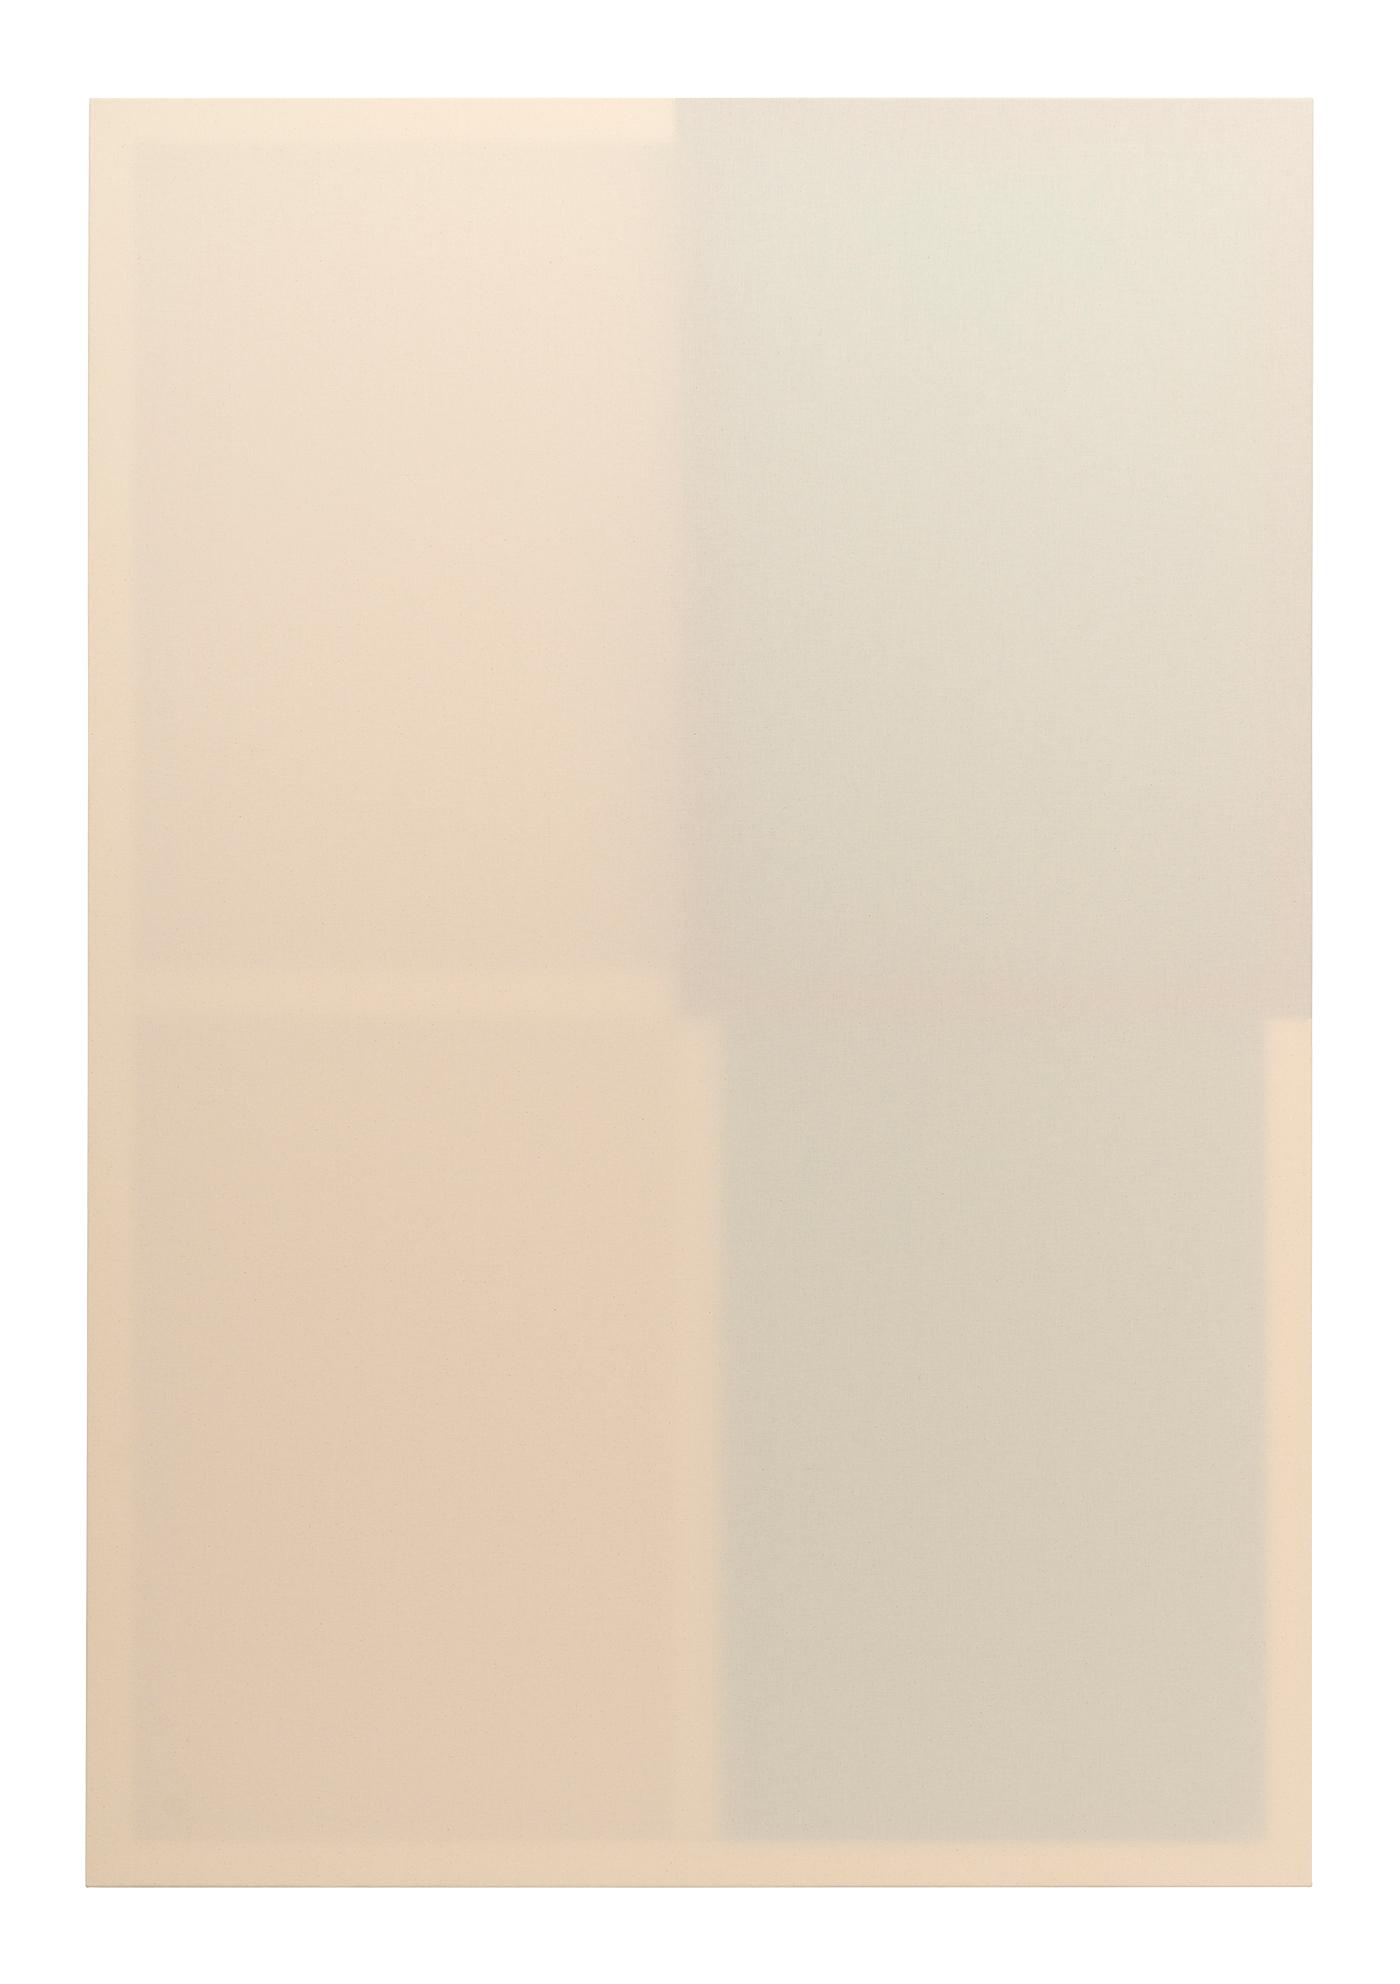 Daniel Schubert, untitled (pieces series 2:3), 2021, wooden stretcher, canvas, distemper, acrylic ,170 x 115 cm